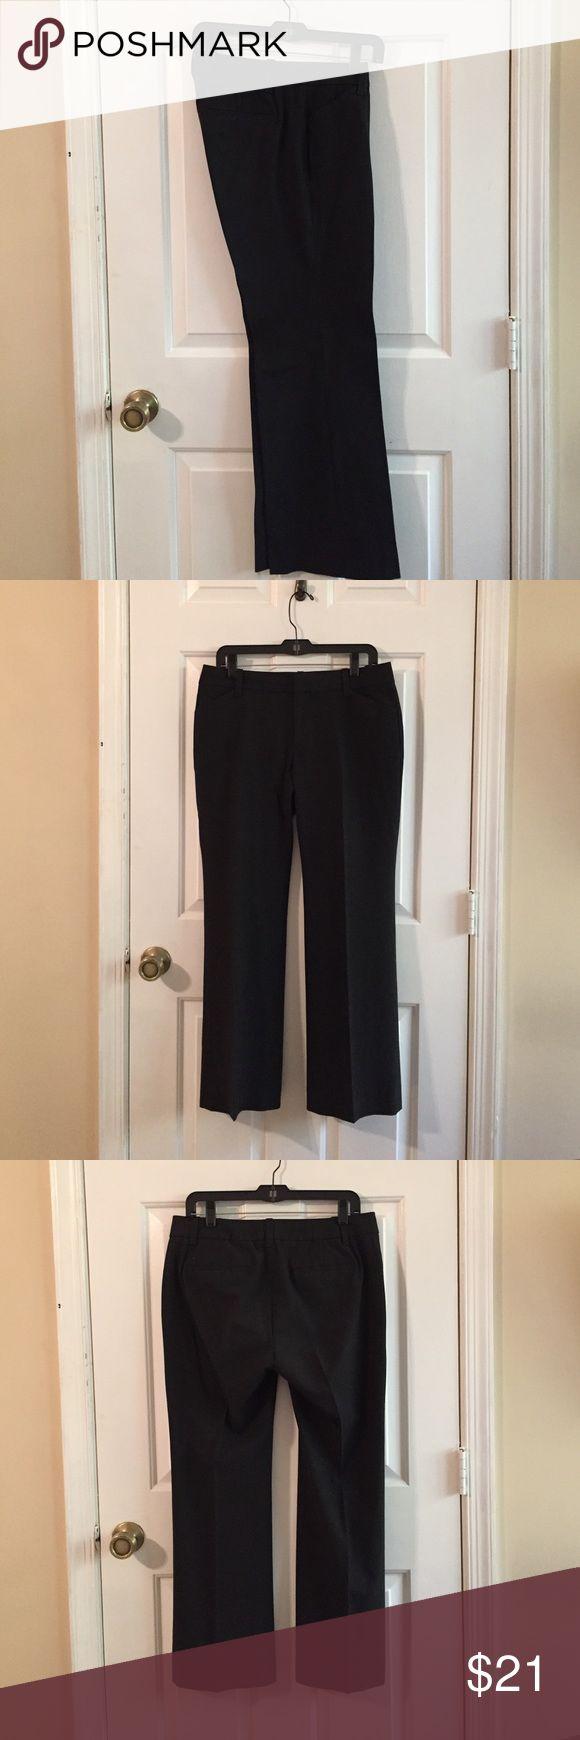 GAP Curvy Stretch Ankle Length 10A Dark Gray GAP Curvy Stretch Ankle Length 10A Dark Gray GAP Pants Trousers